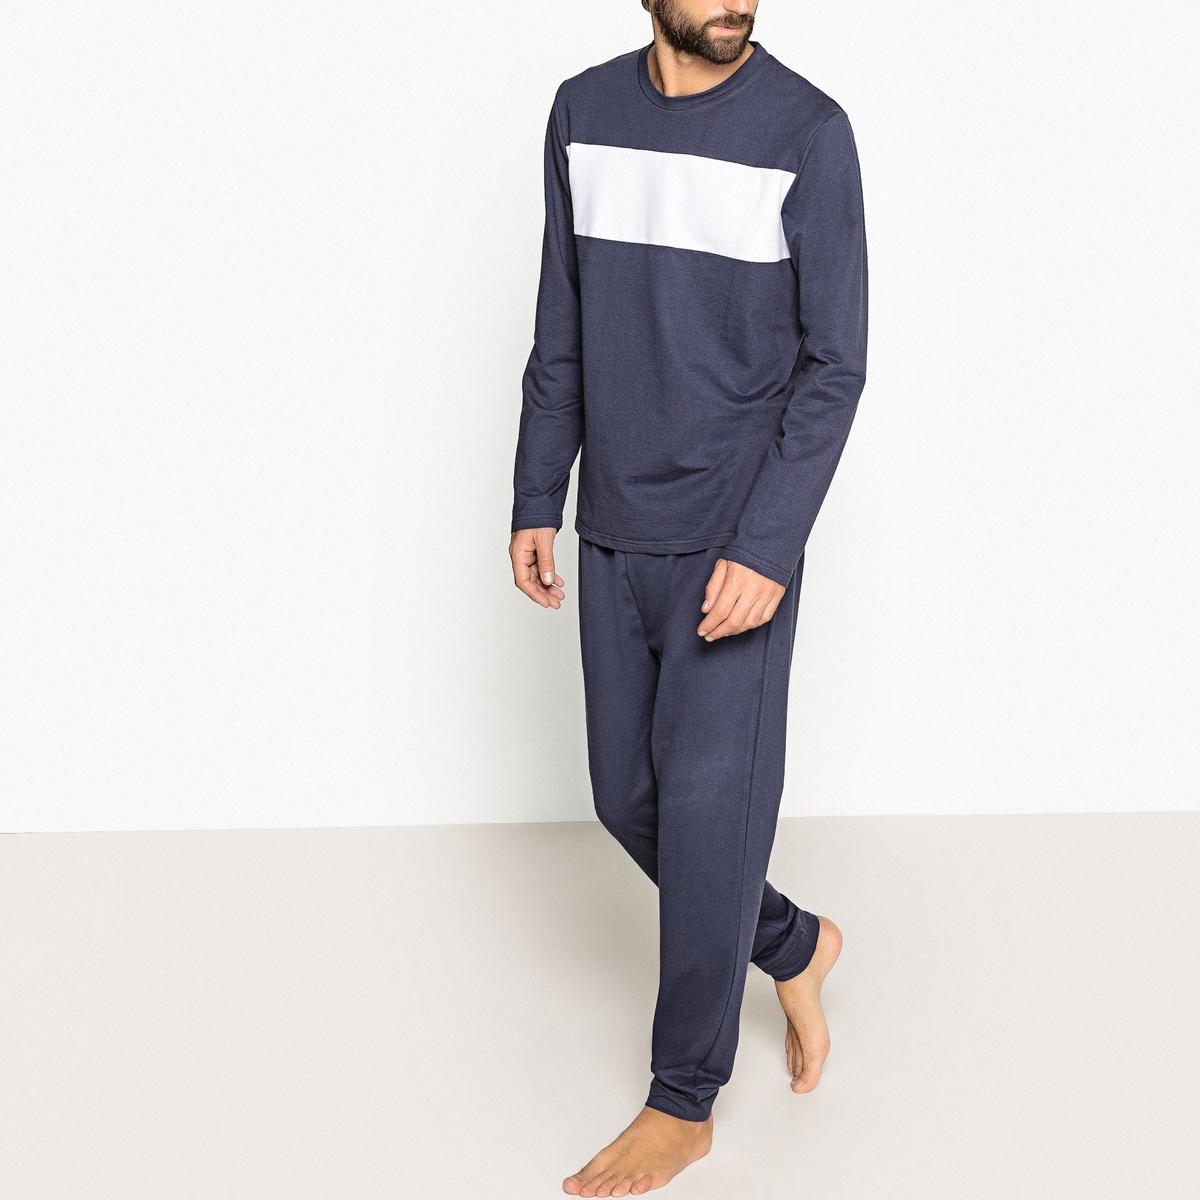 Пижама двухцветная из мольтона пижама